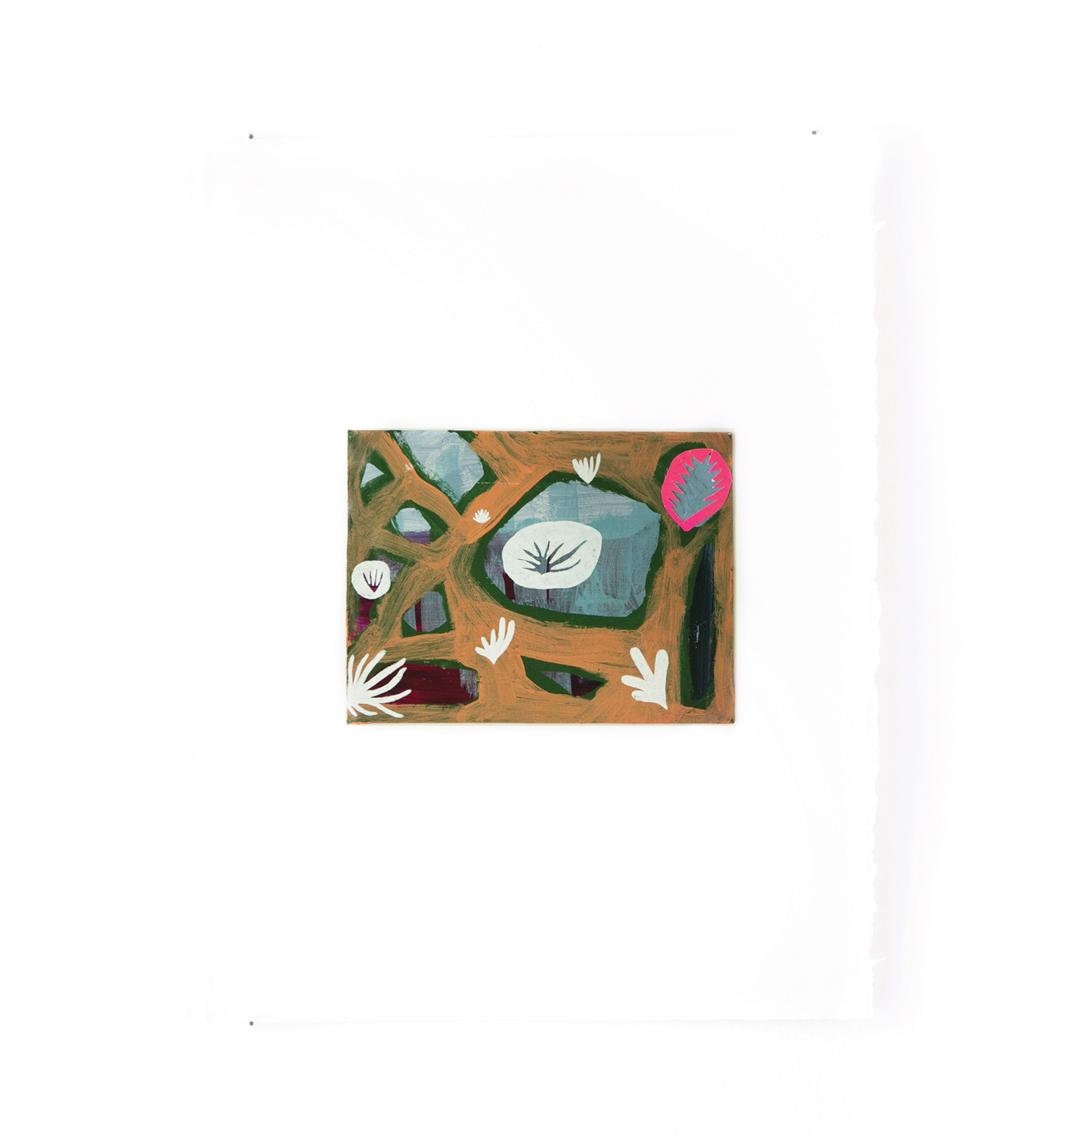 Arizona - Peinture acrylique sur carton - 33 x 44 cm - 2016